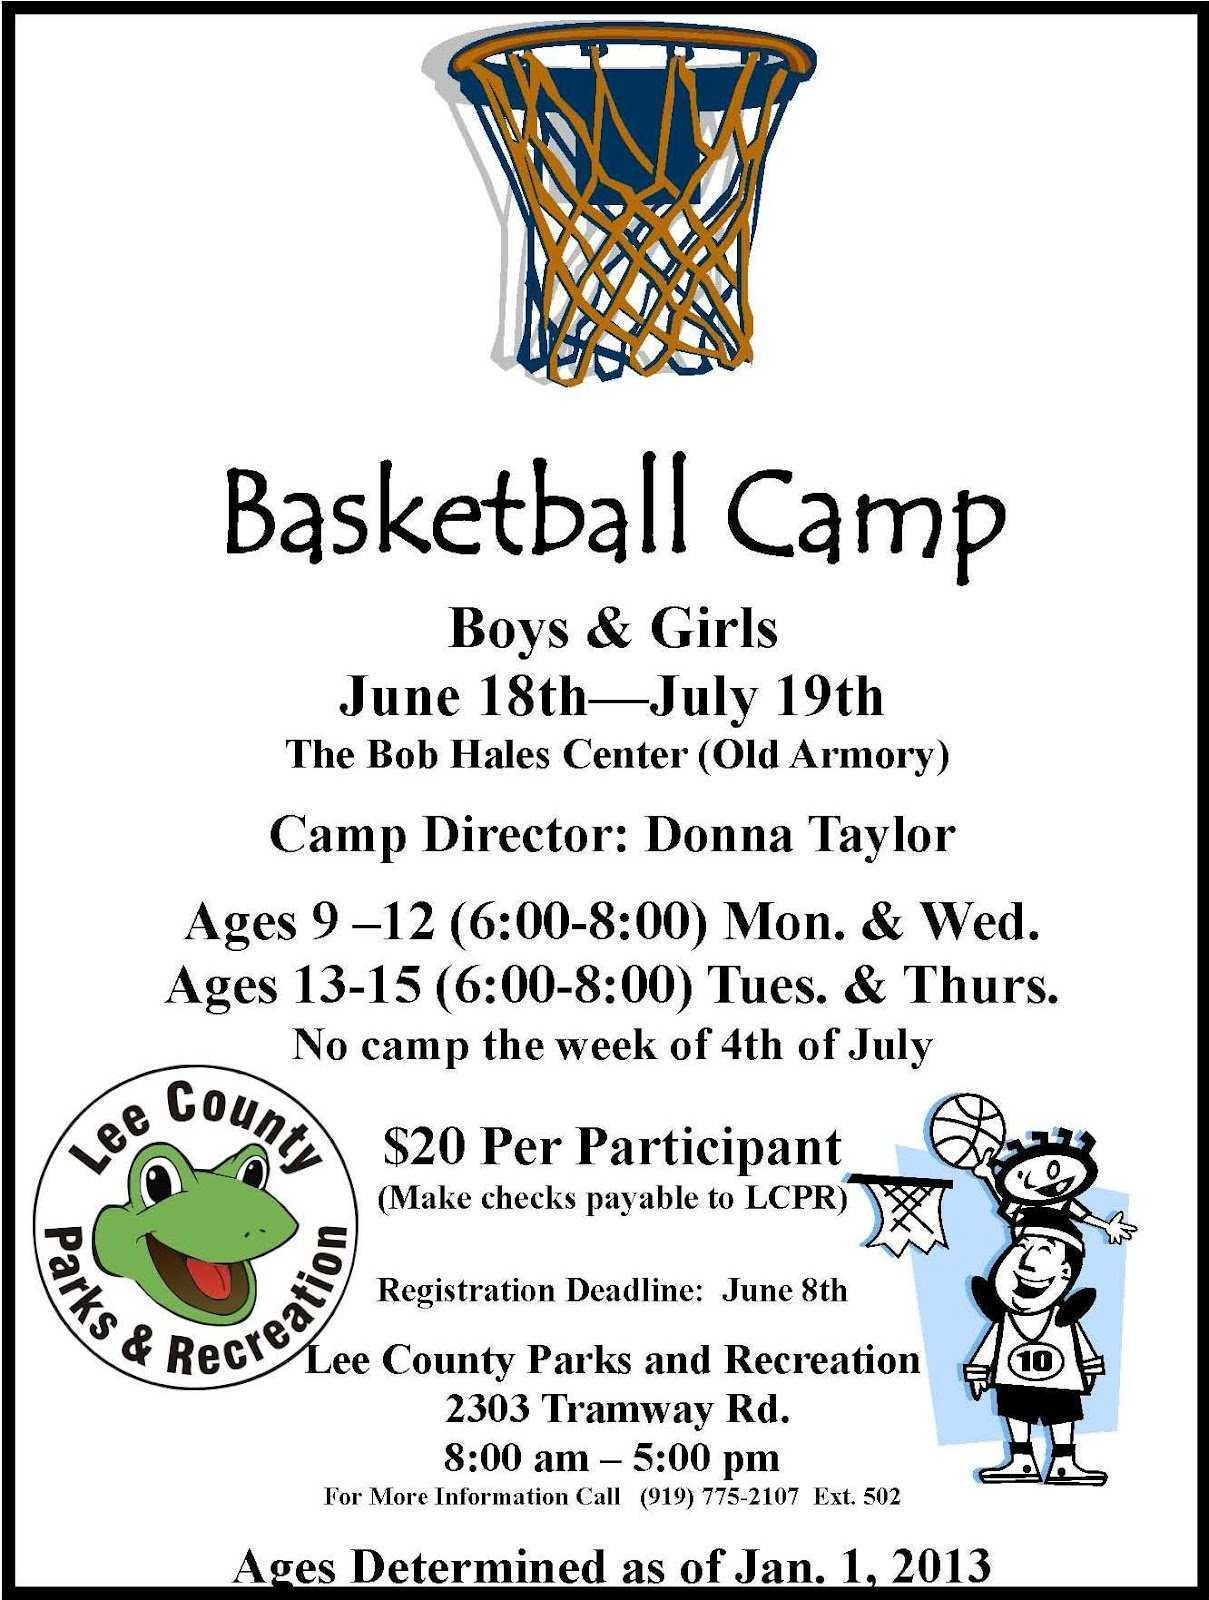 82 Customize Basketball Camp Flyer Template Layouts for Basketball Camp Flyer Template